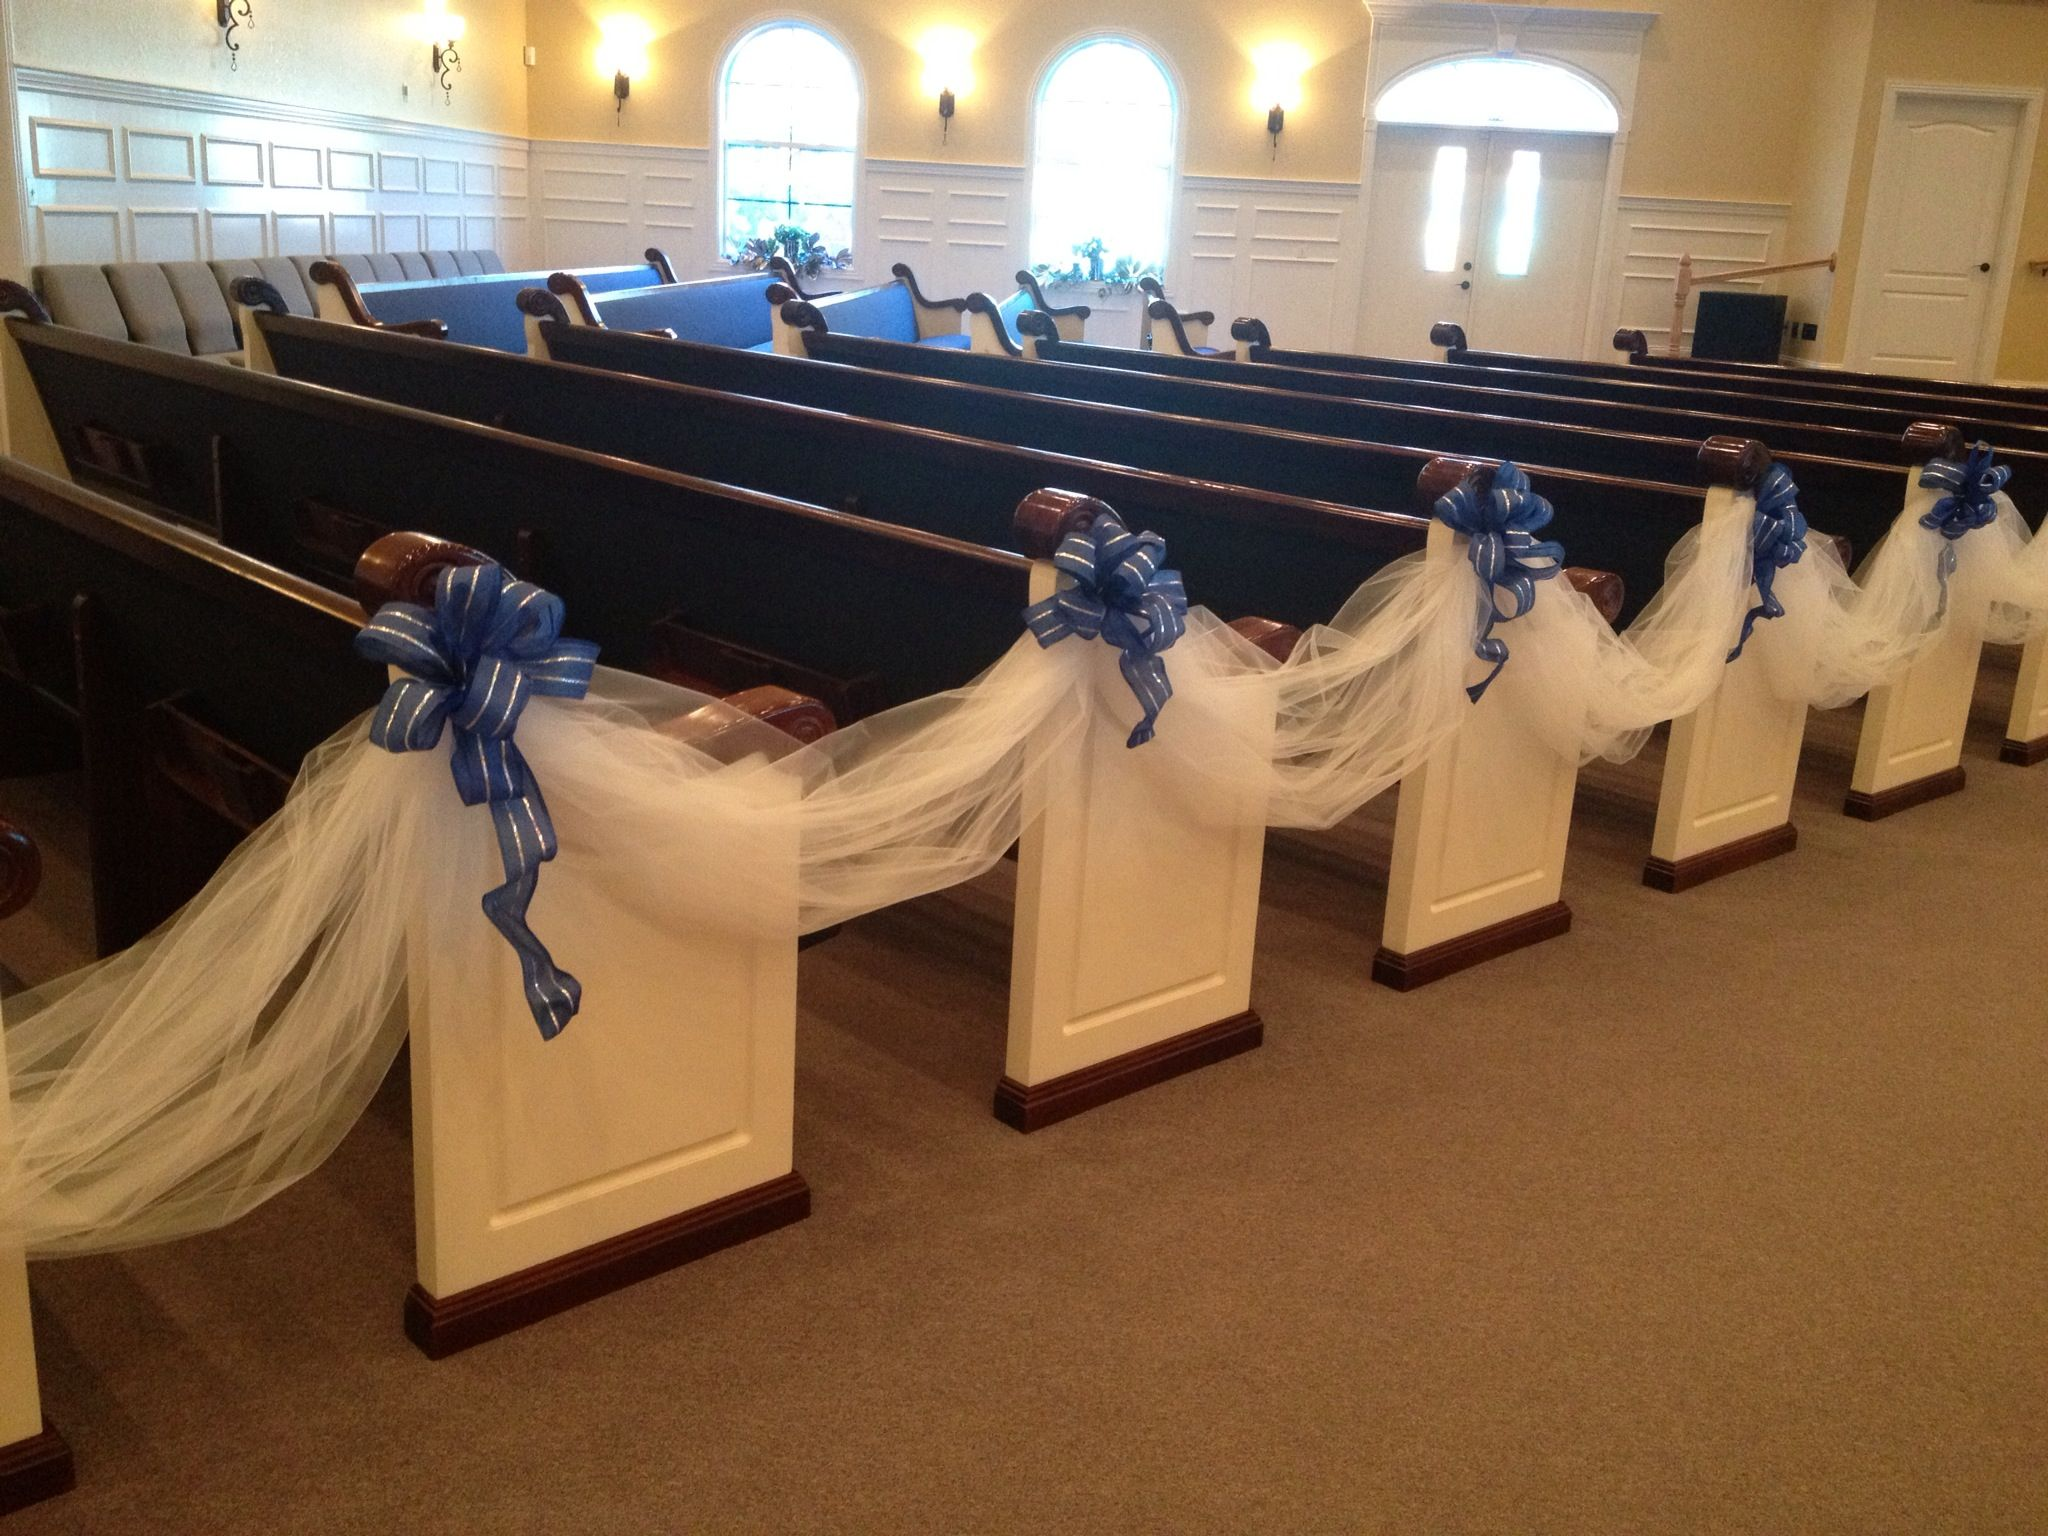 royal blue and silver wedding centerpieces%0A Royal blue and silver aisle runner